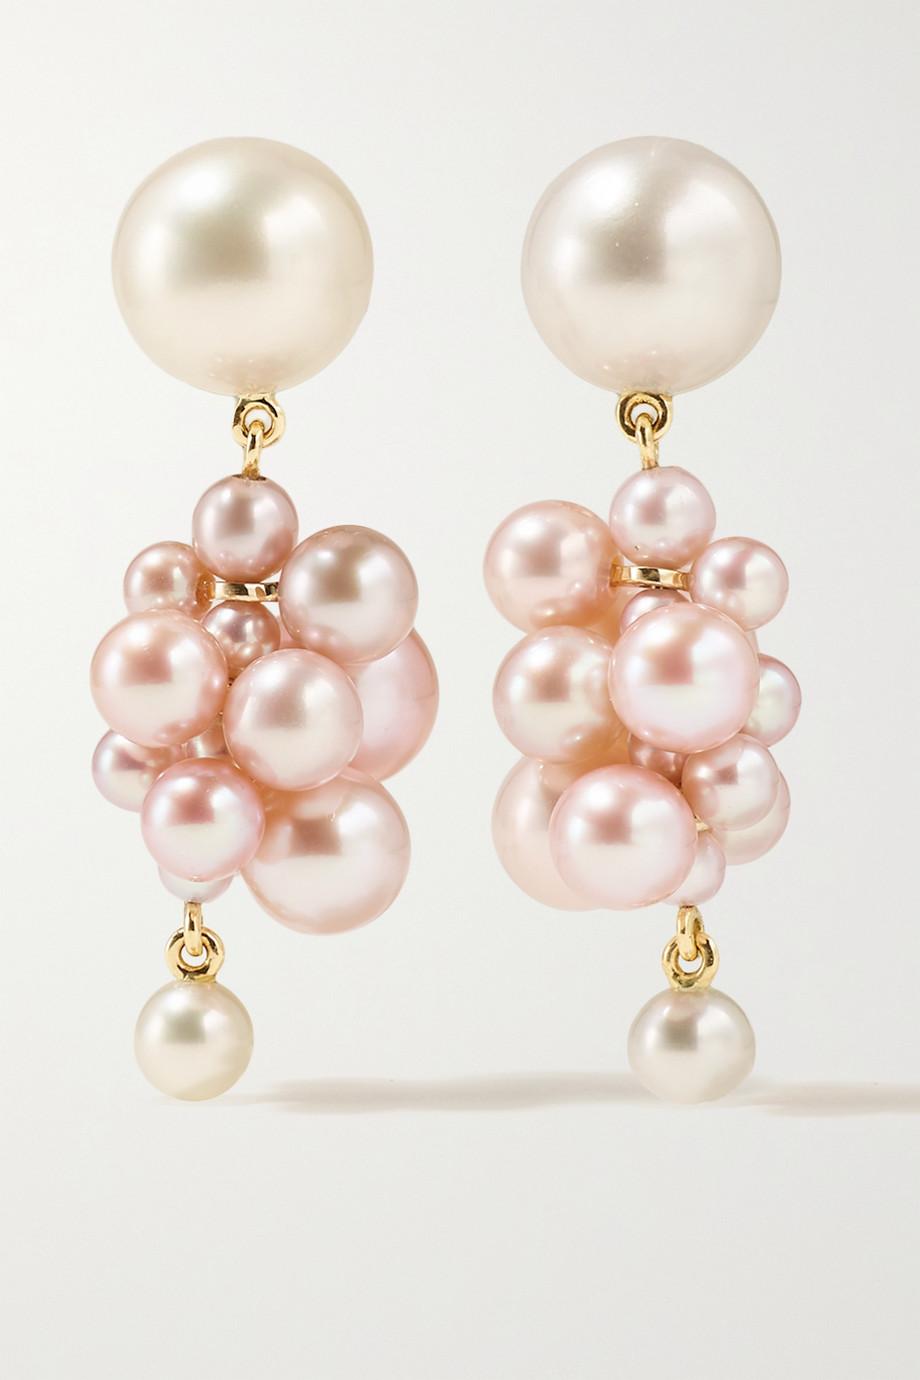 Sophie Bille Brahe Botticelli Rose 14-karat gold pearl earrings